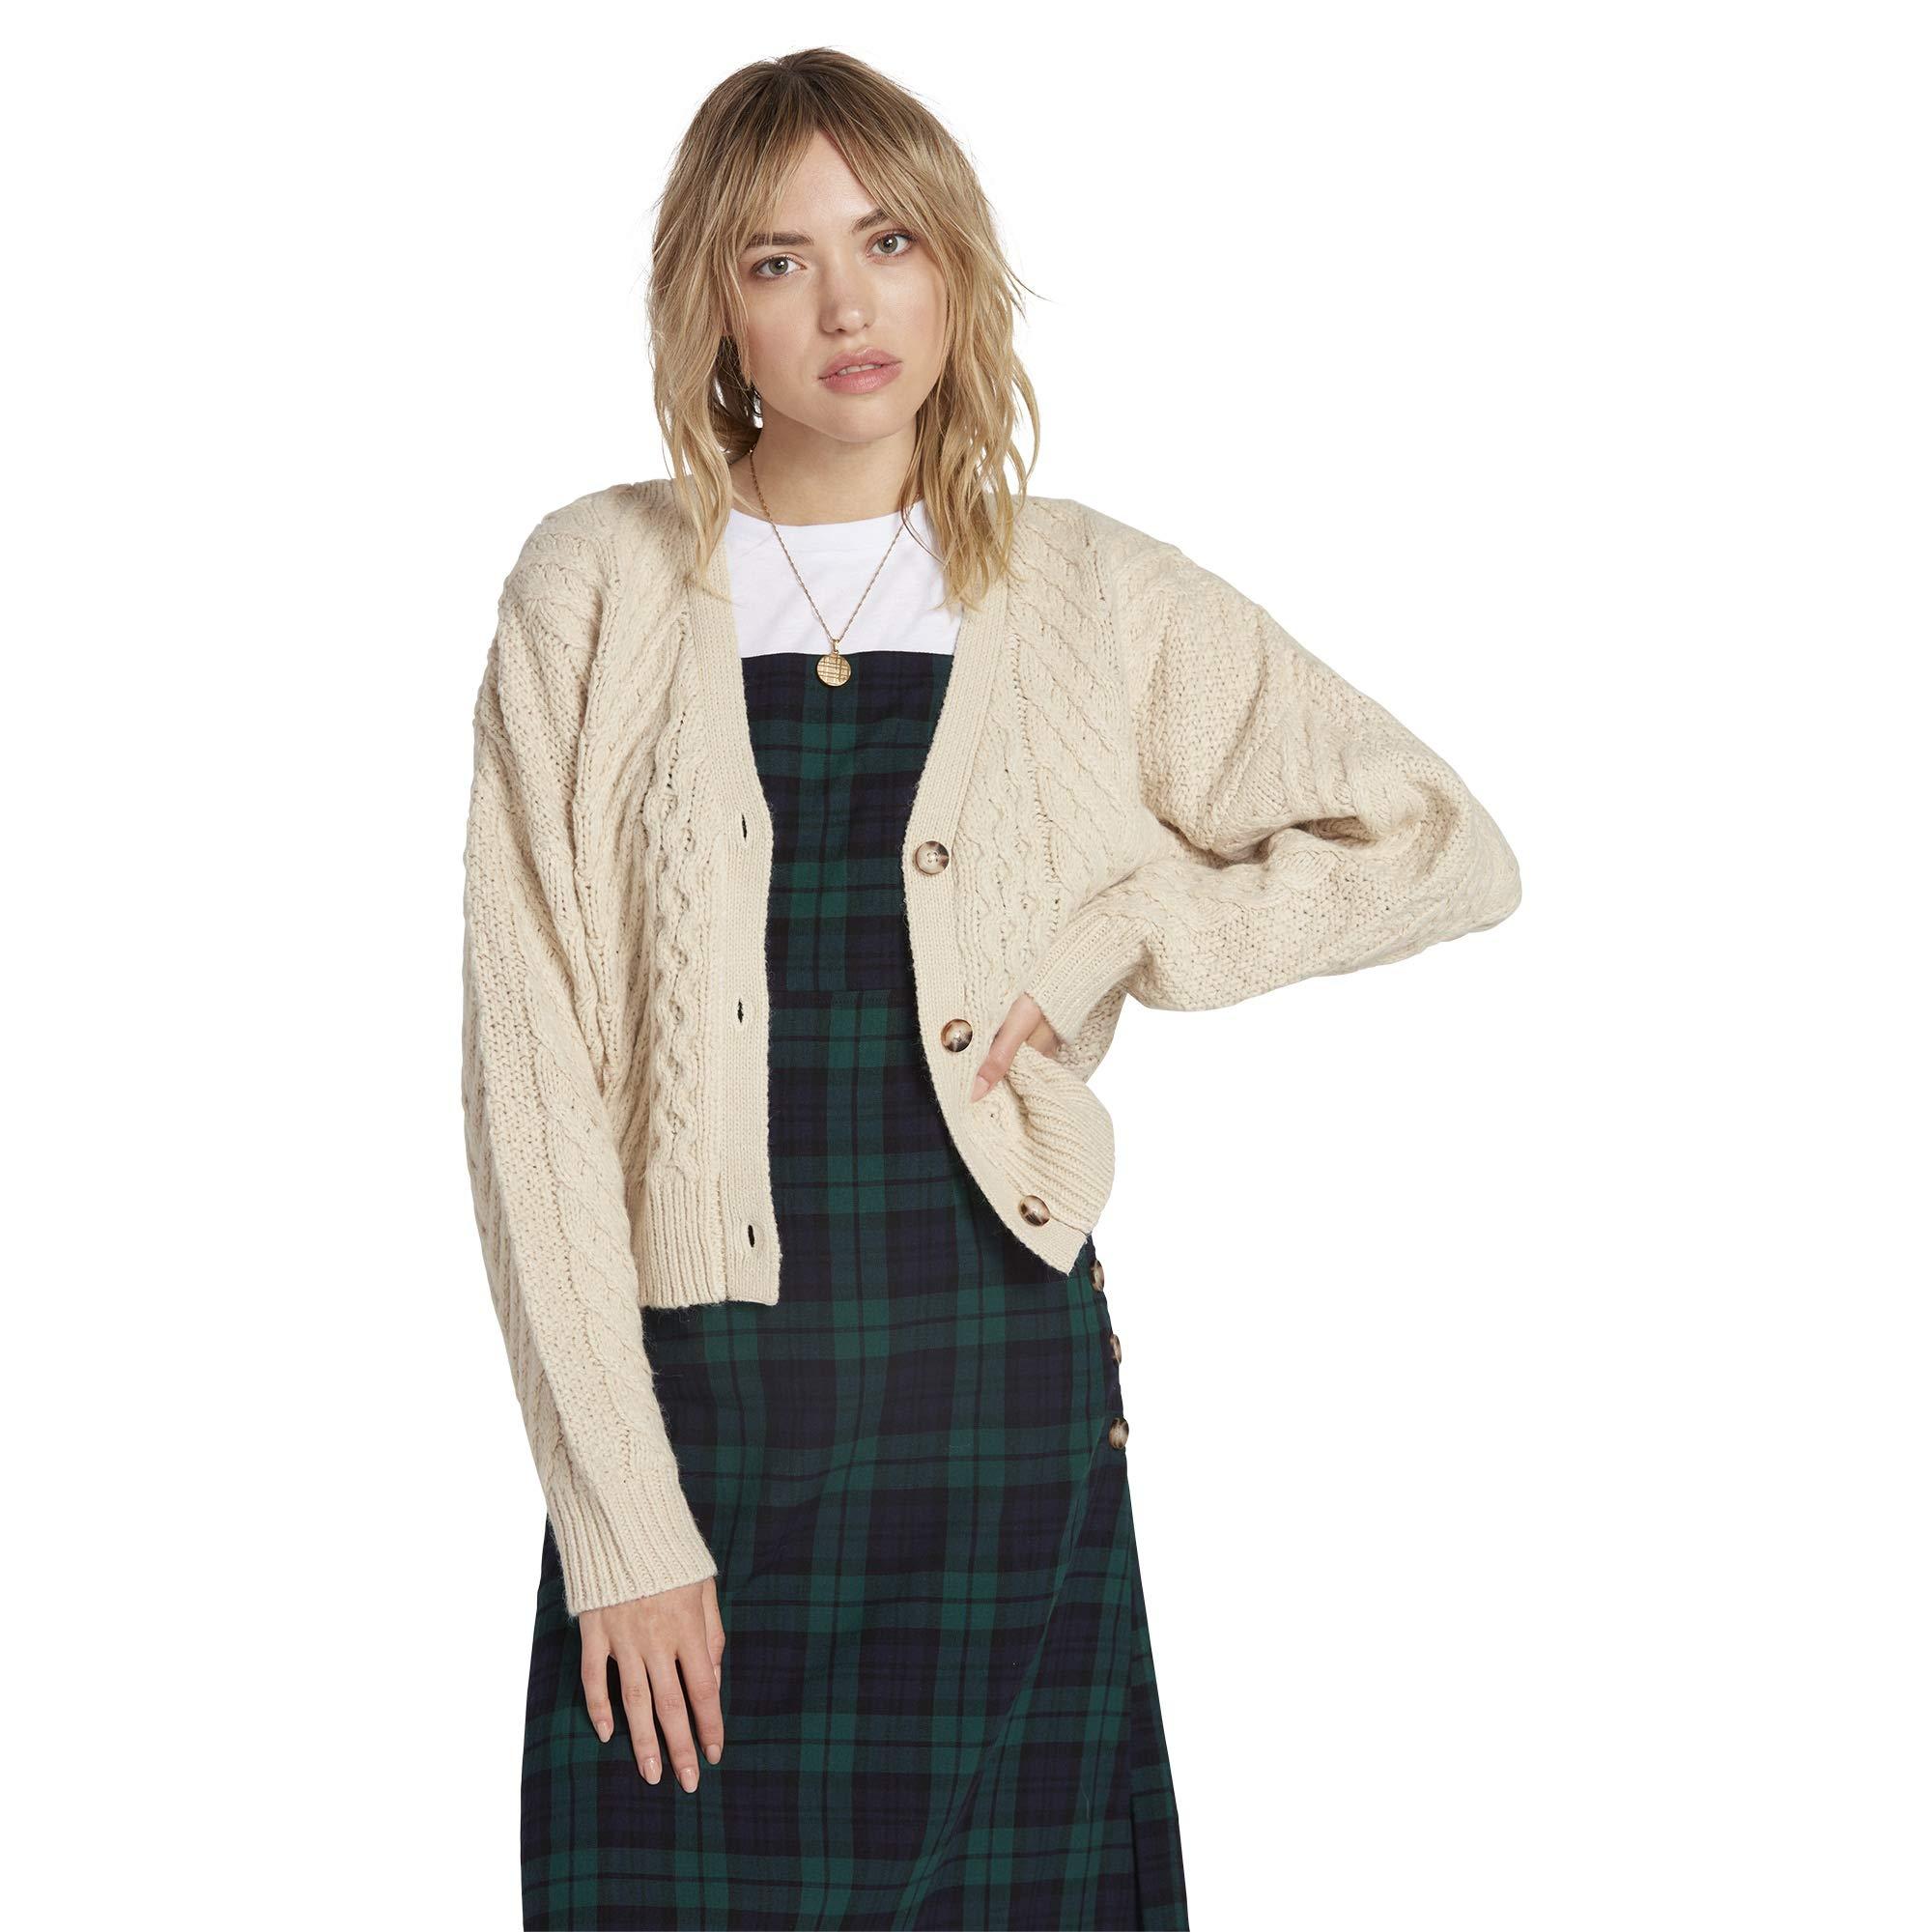 Volcom Women's Bettergetter Boxy Cardigan Sweater, Cream, Medium by Volcom